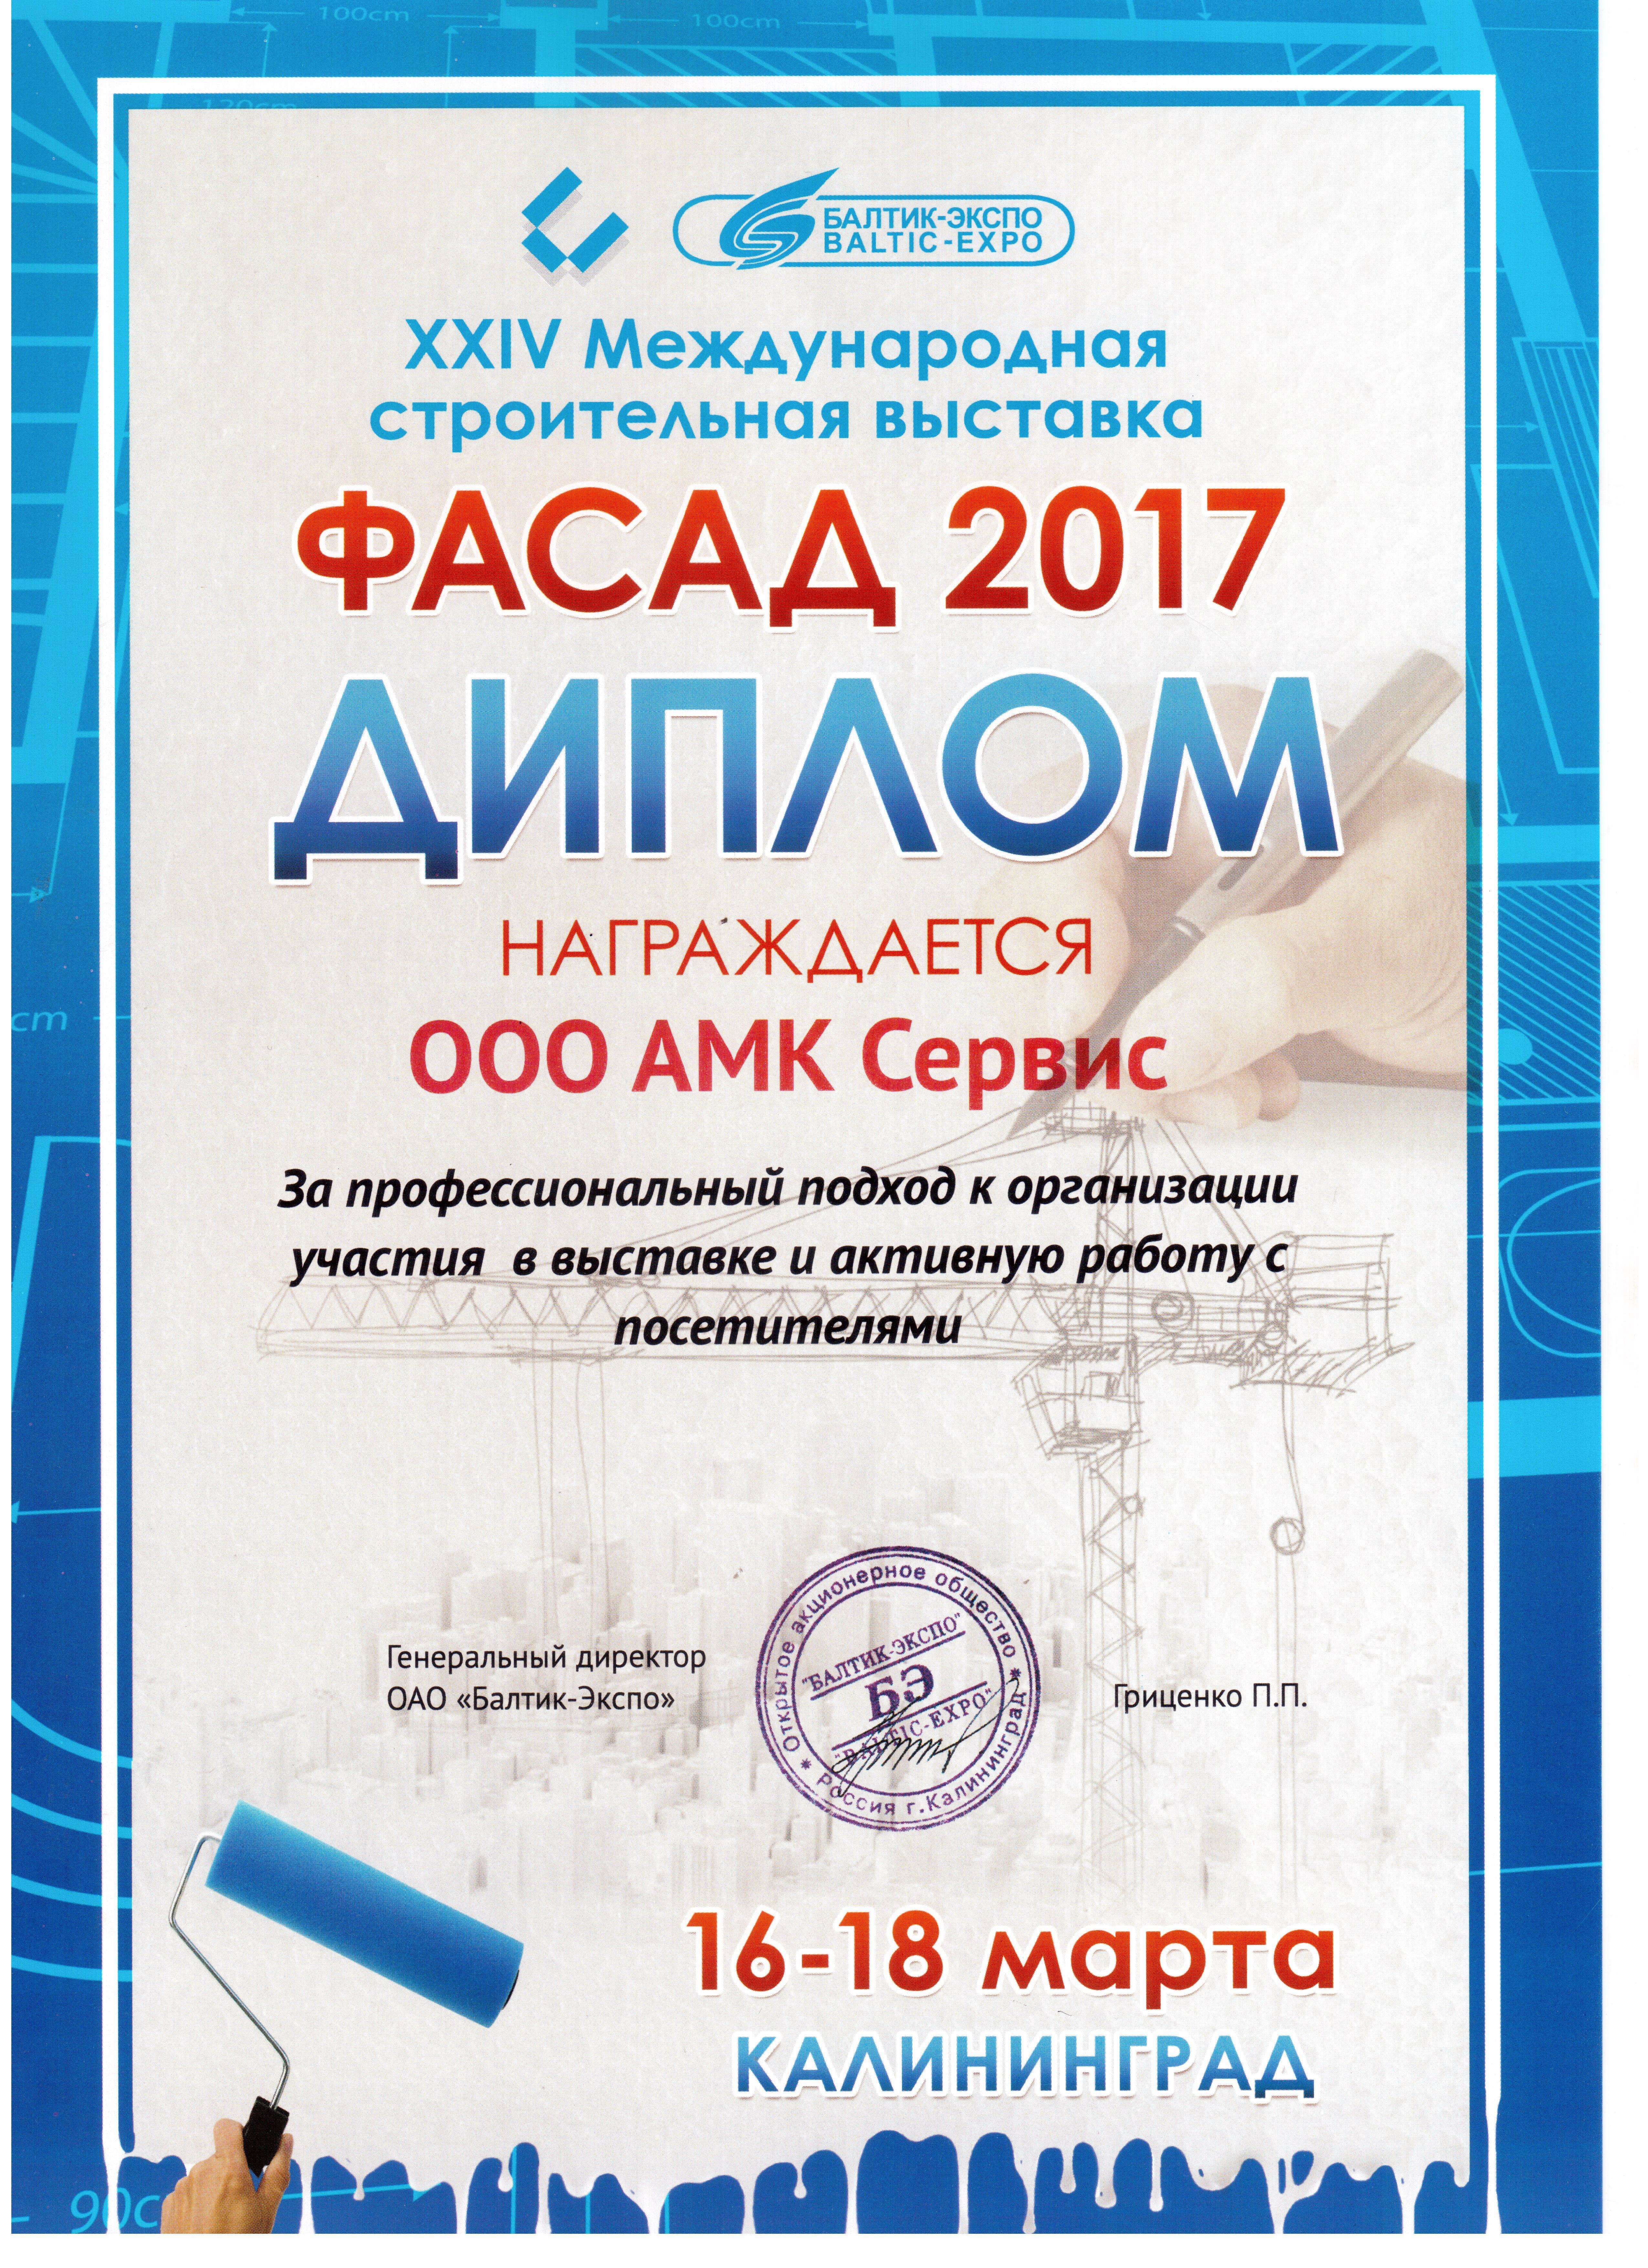 АМК Сервис производитель станков ЧПУ участник Фасад 2017 Калининград